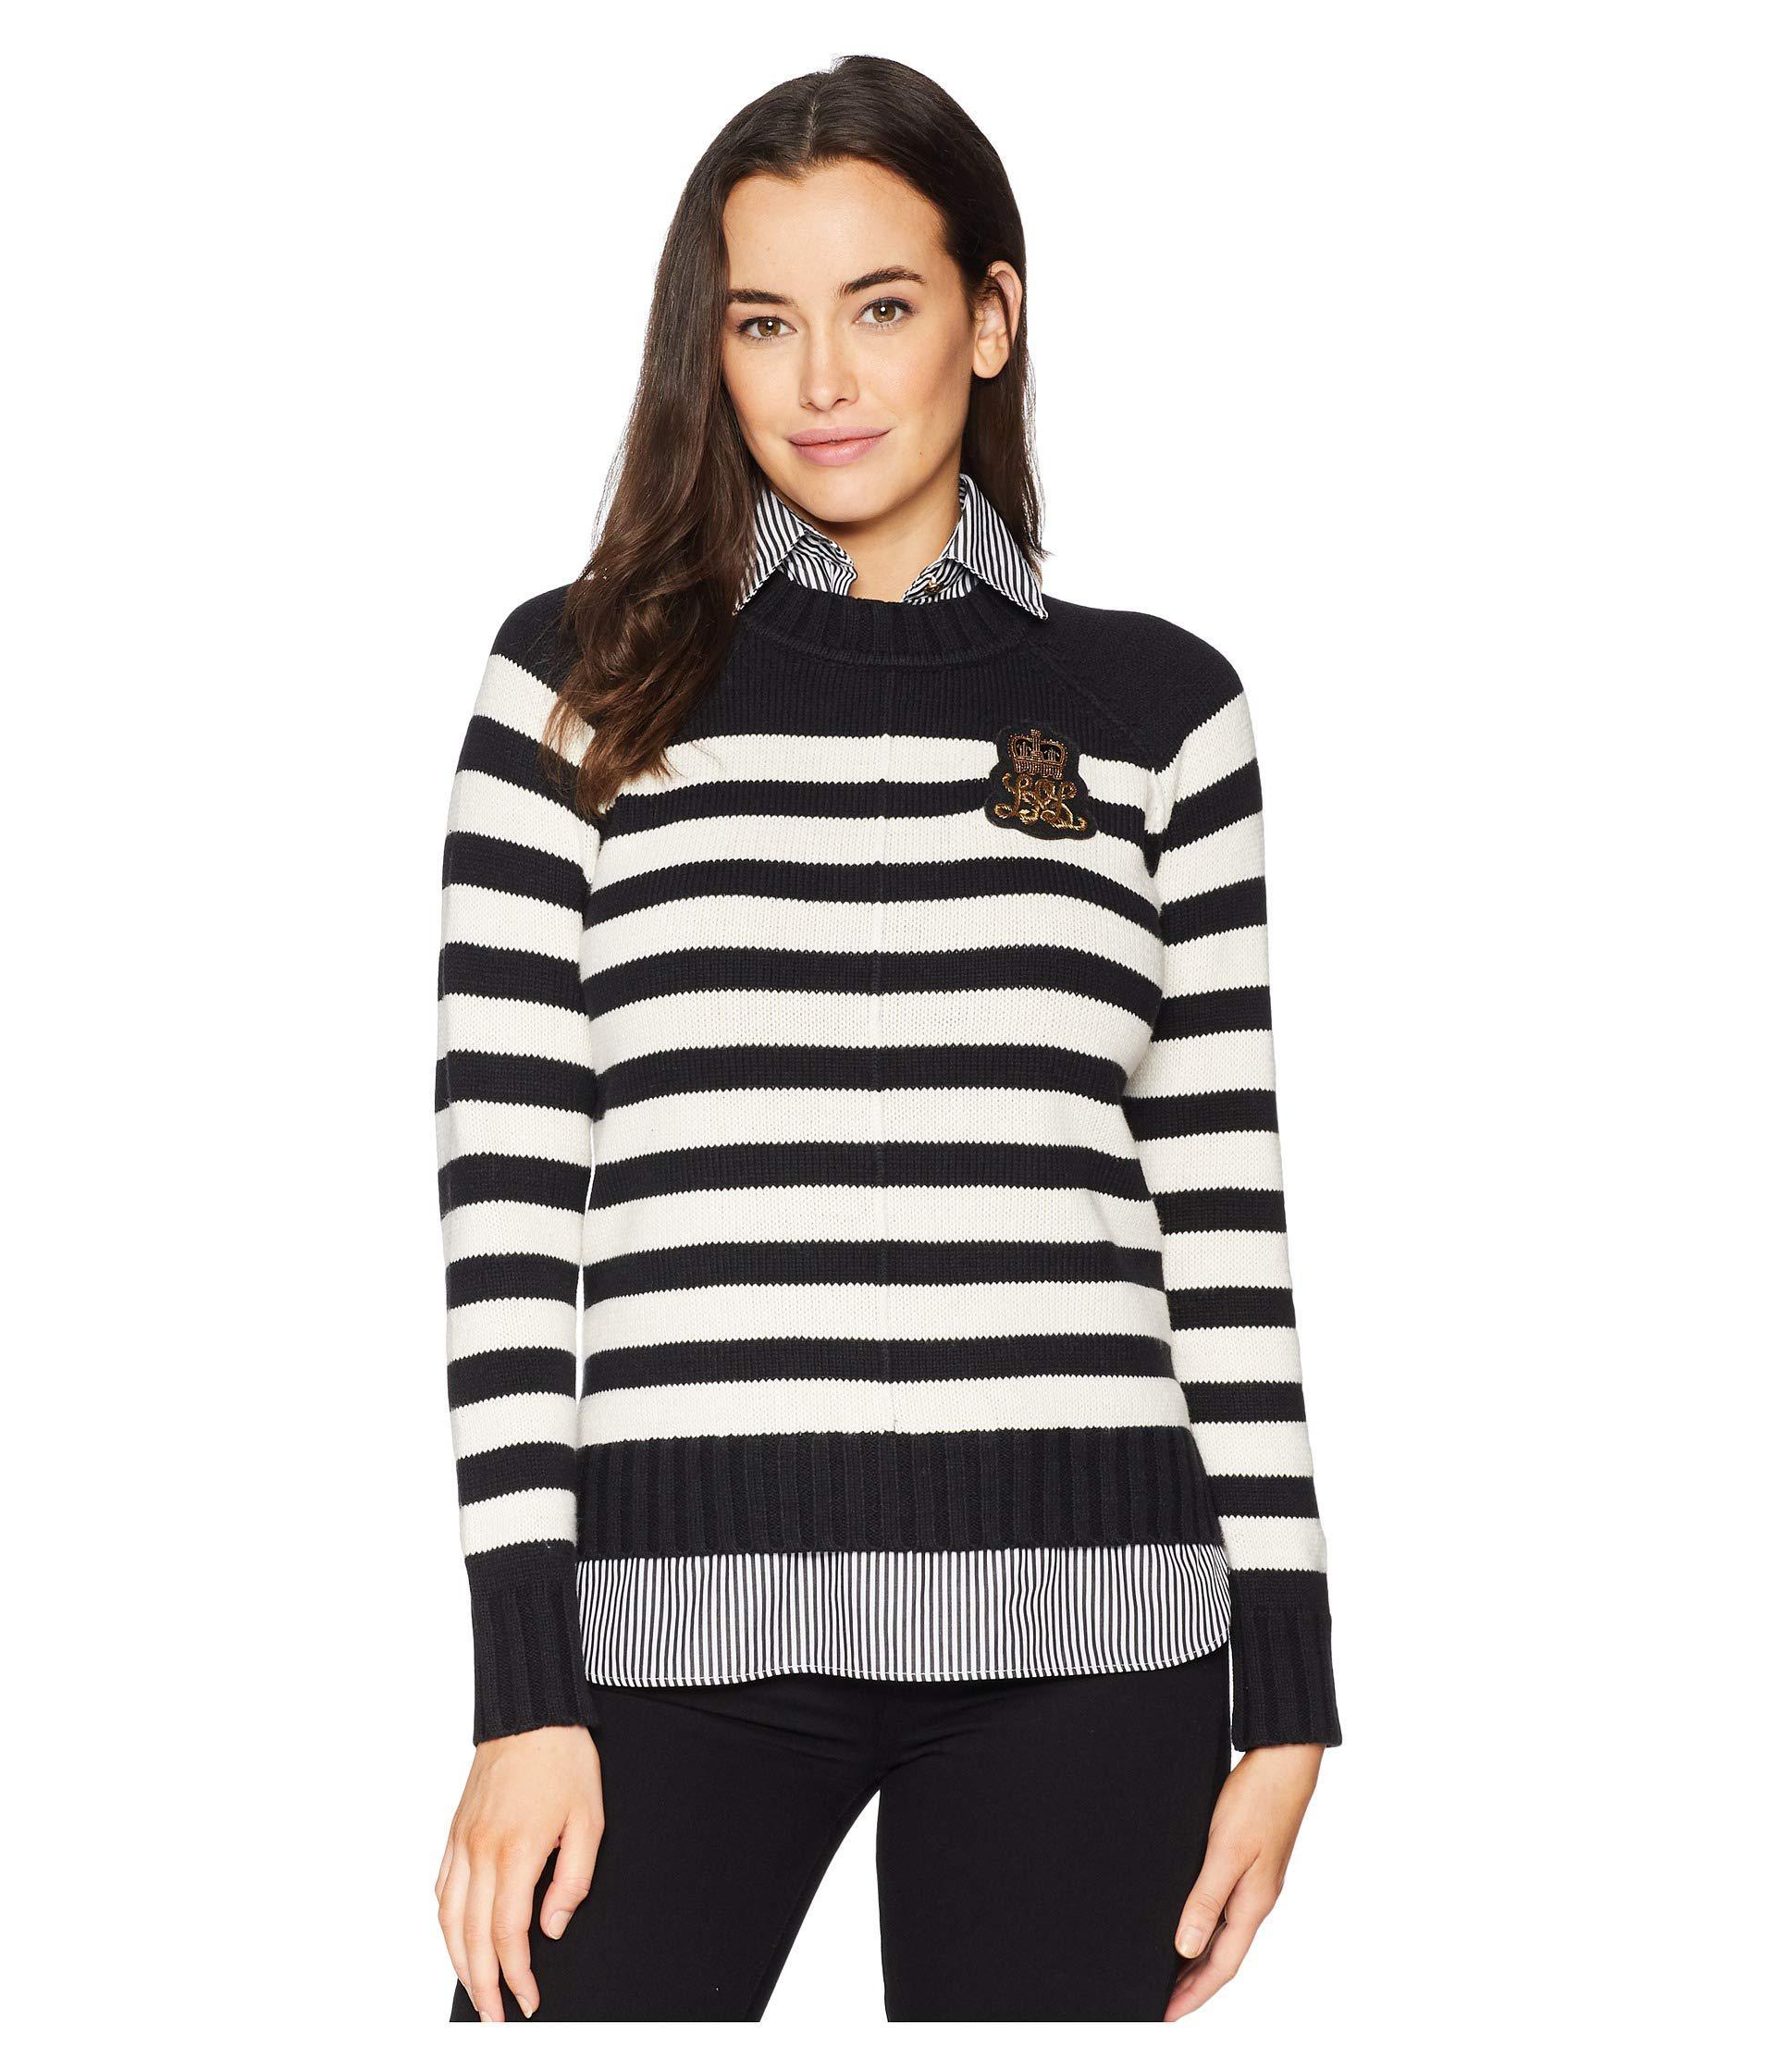 Lyst - Lauren by Ralph Lauren Bullion-patch Layered Shirt in Black ... b6418de2bf22